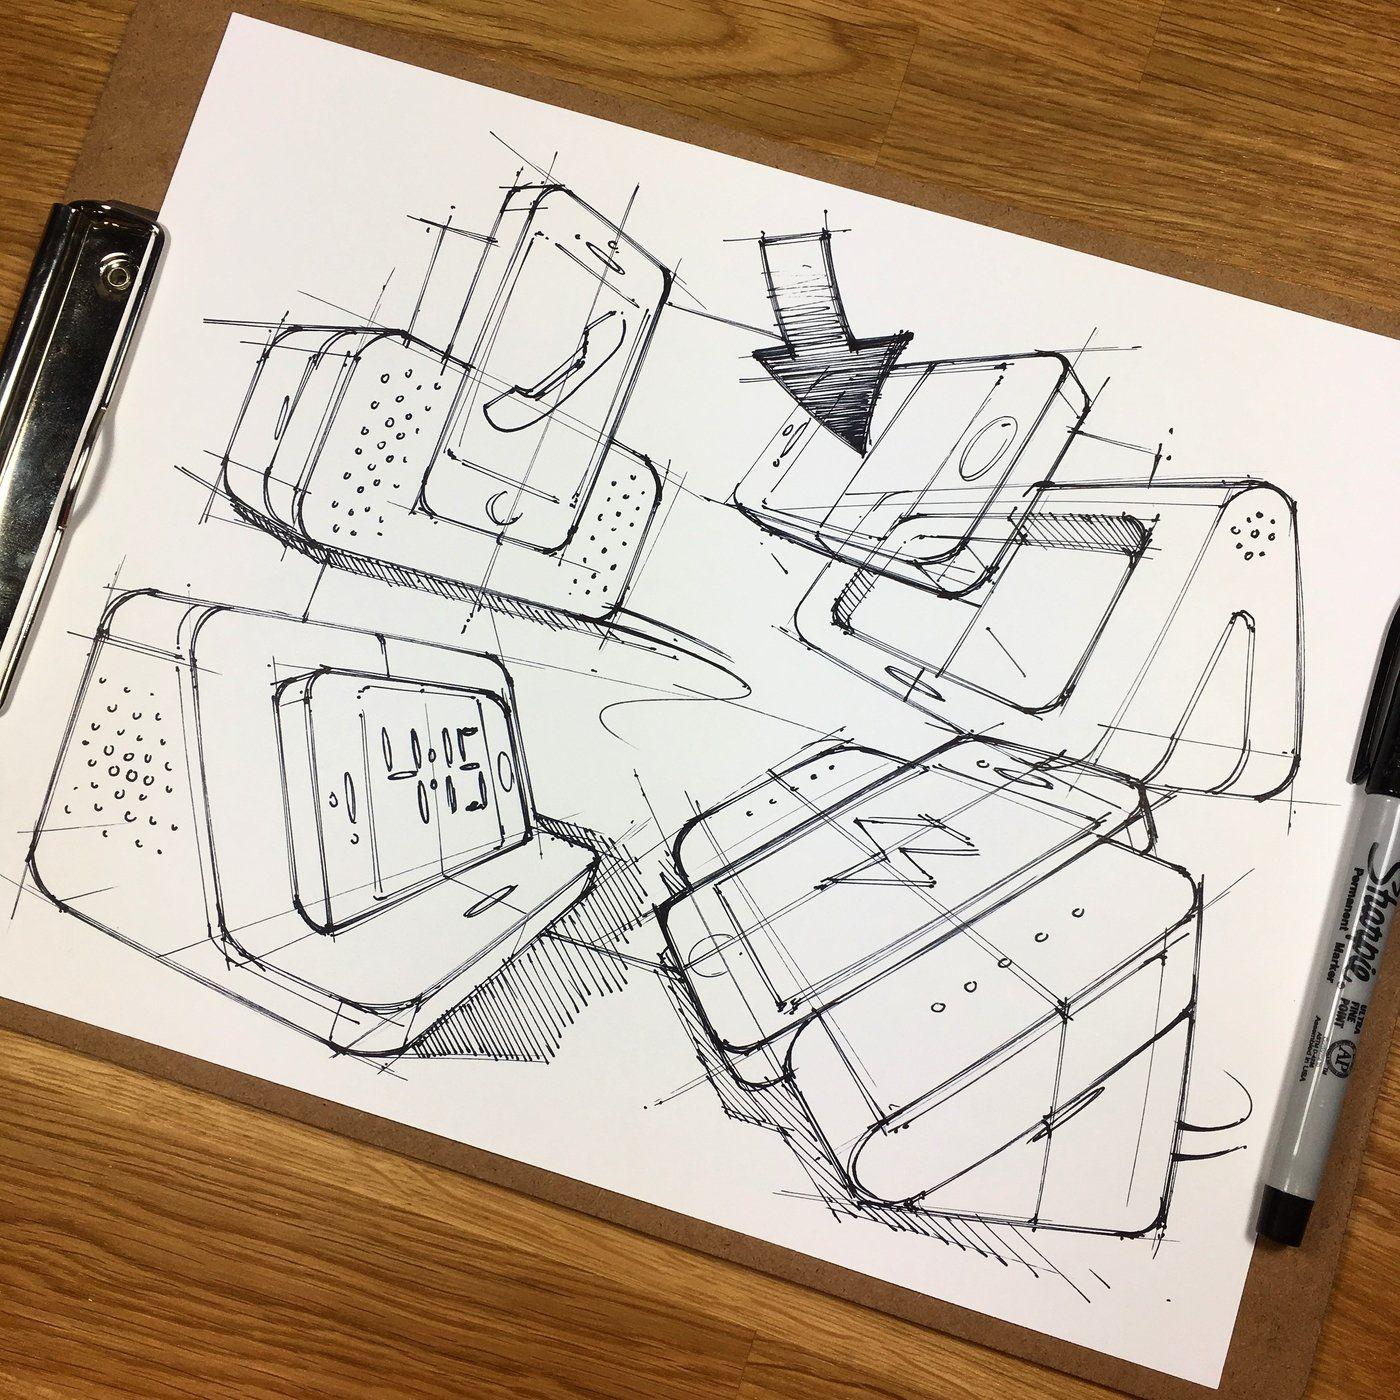 Pin By Ximena Quintana On Di Industrial Design Sketch Design